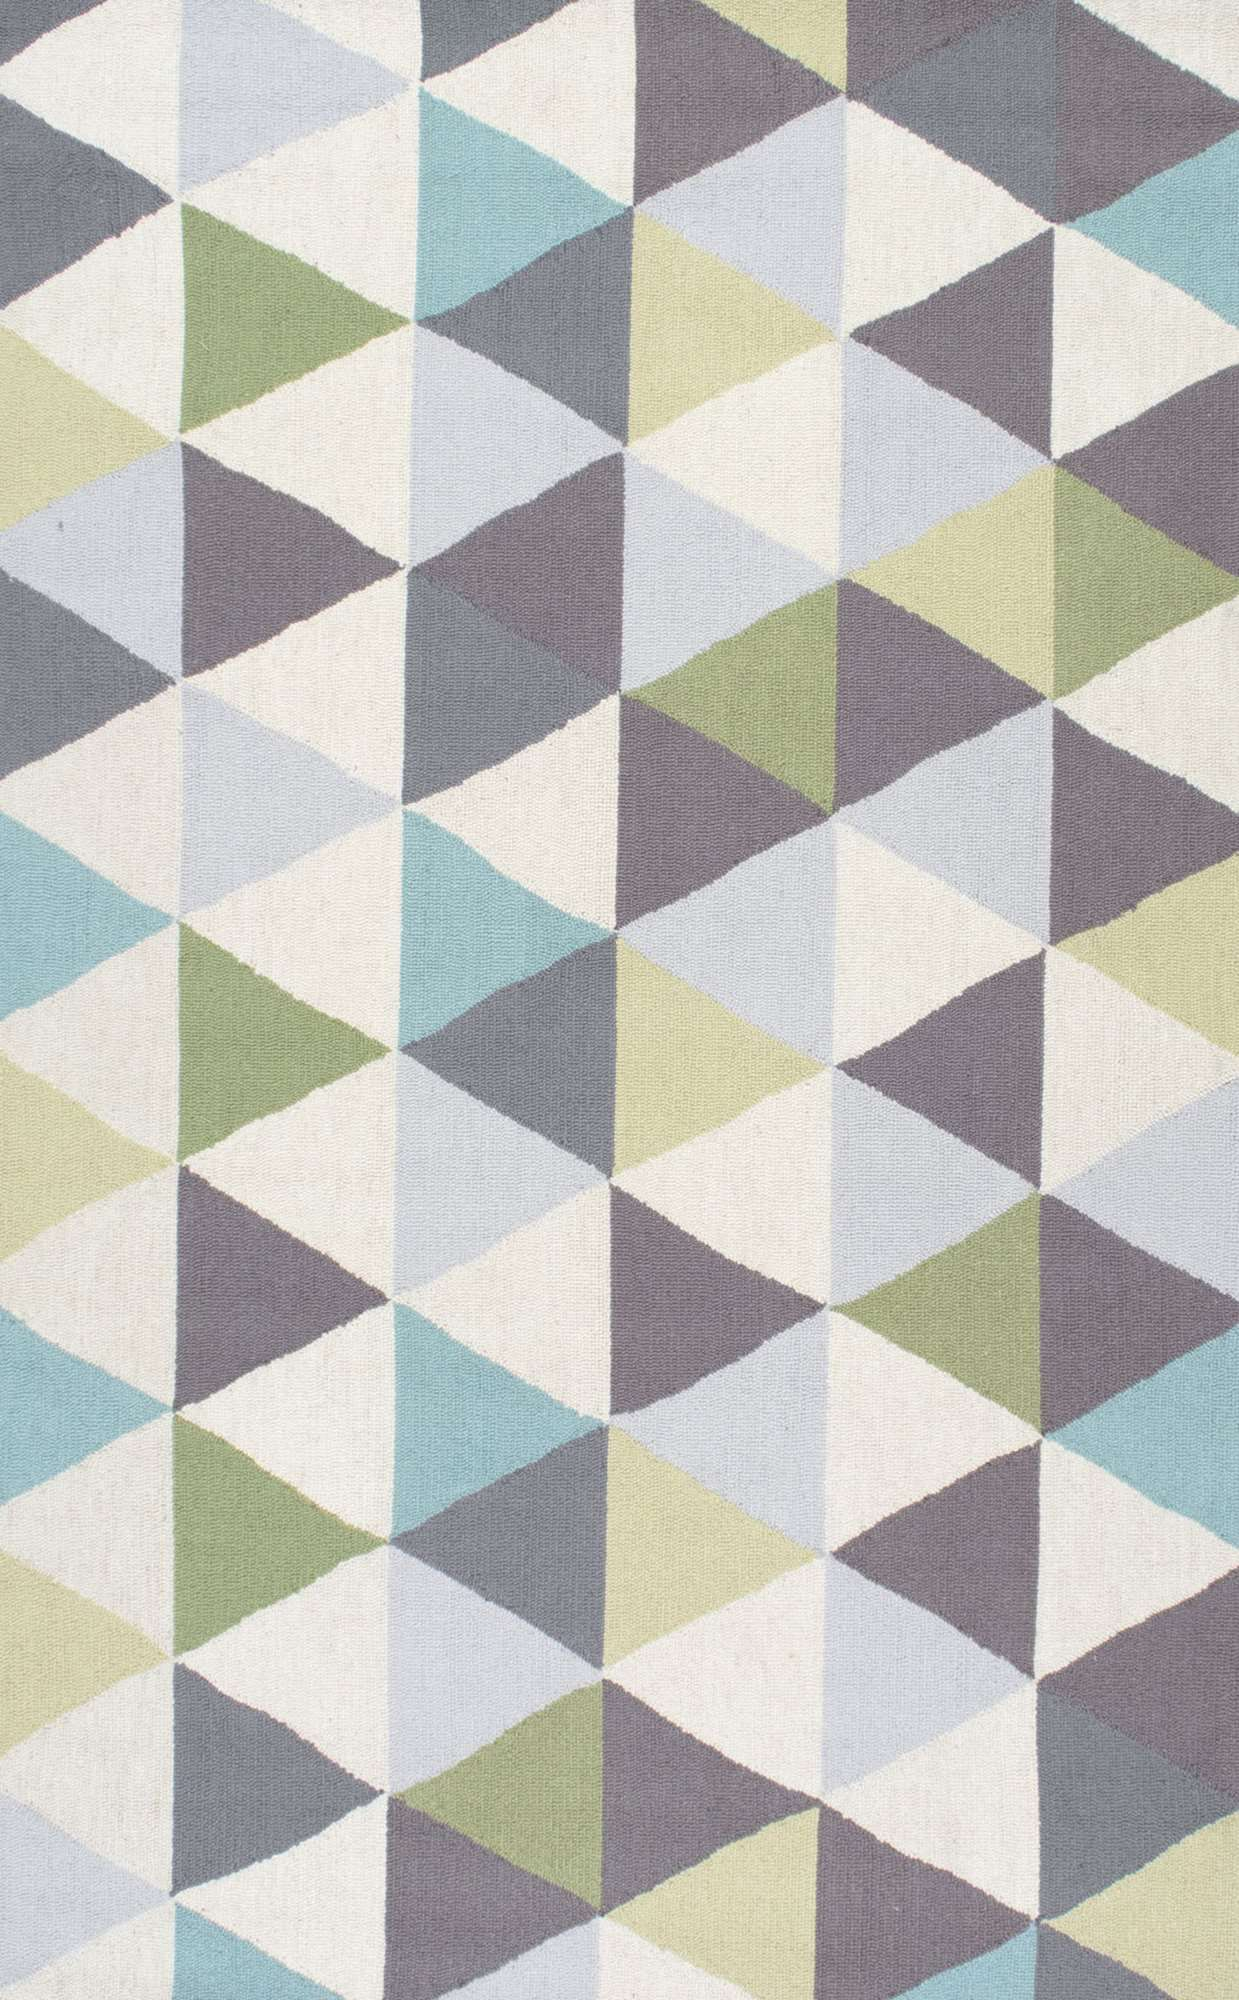 Homespunhk110 Dimensional Triangles Rug Eat In Kitchen